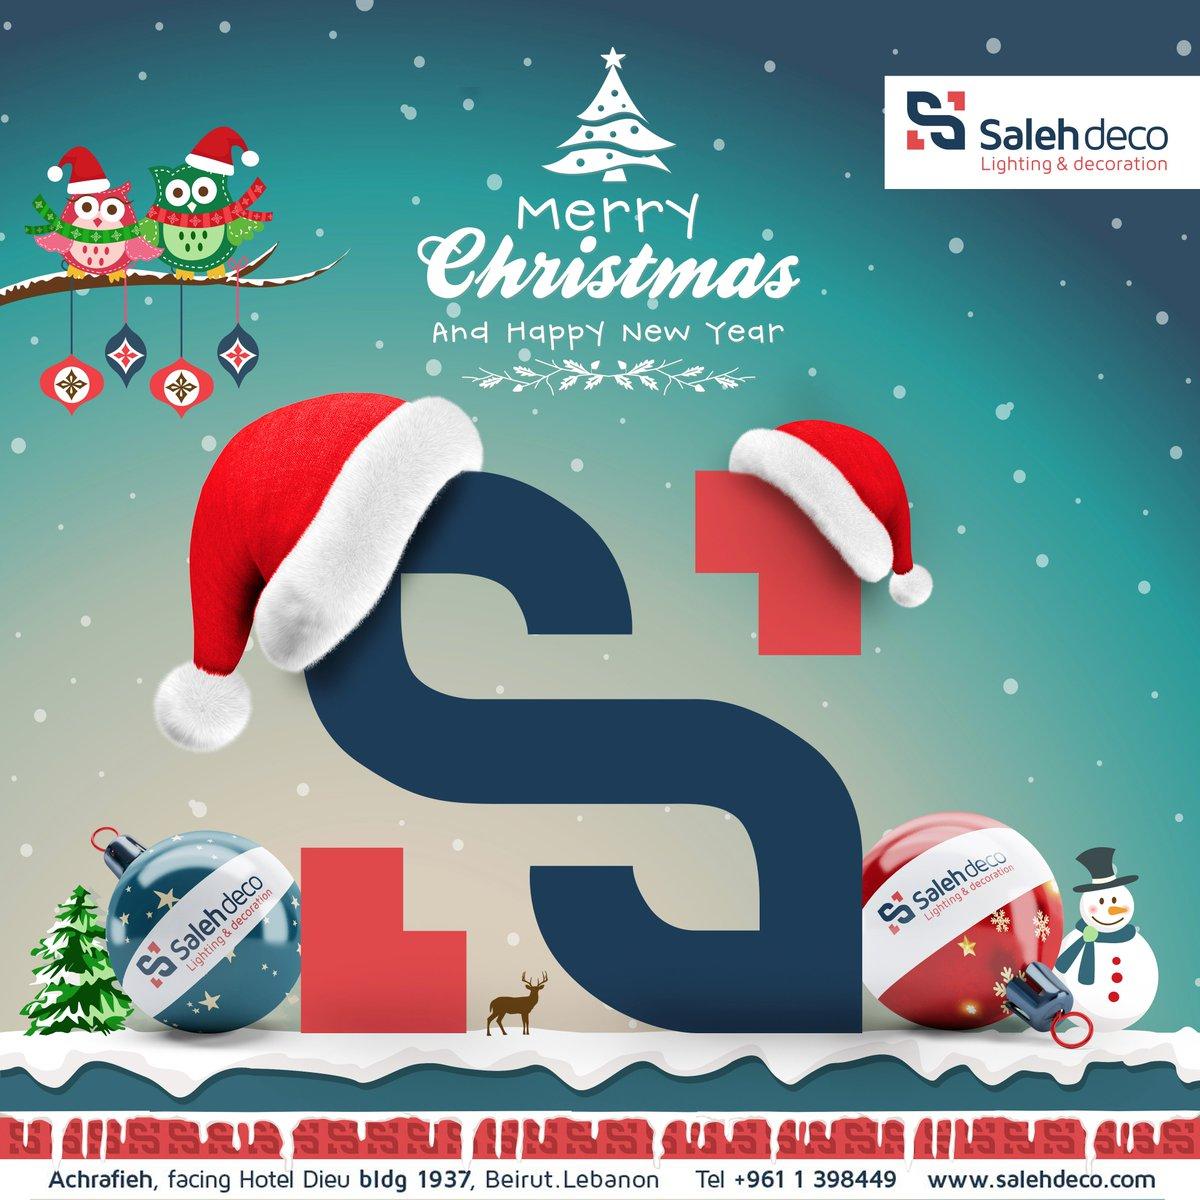 #MerryChristmas to all! #gift #Celebrate #Celebration #Christmas #ChristmasDay #HappyHolidays #Xmas #salehdeco https://t.co/7kw5rtL9Wh